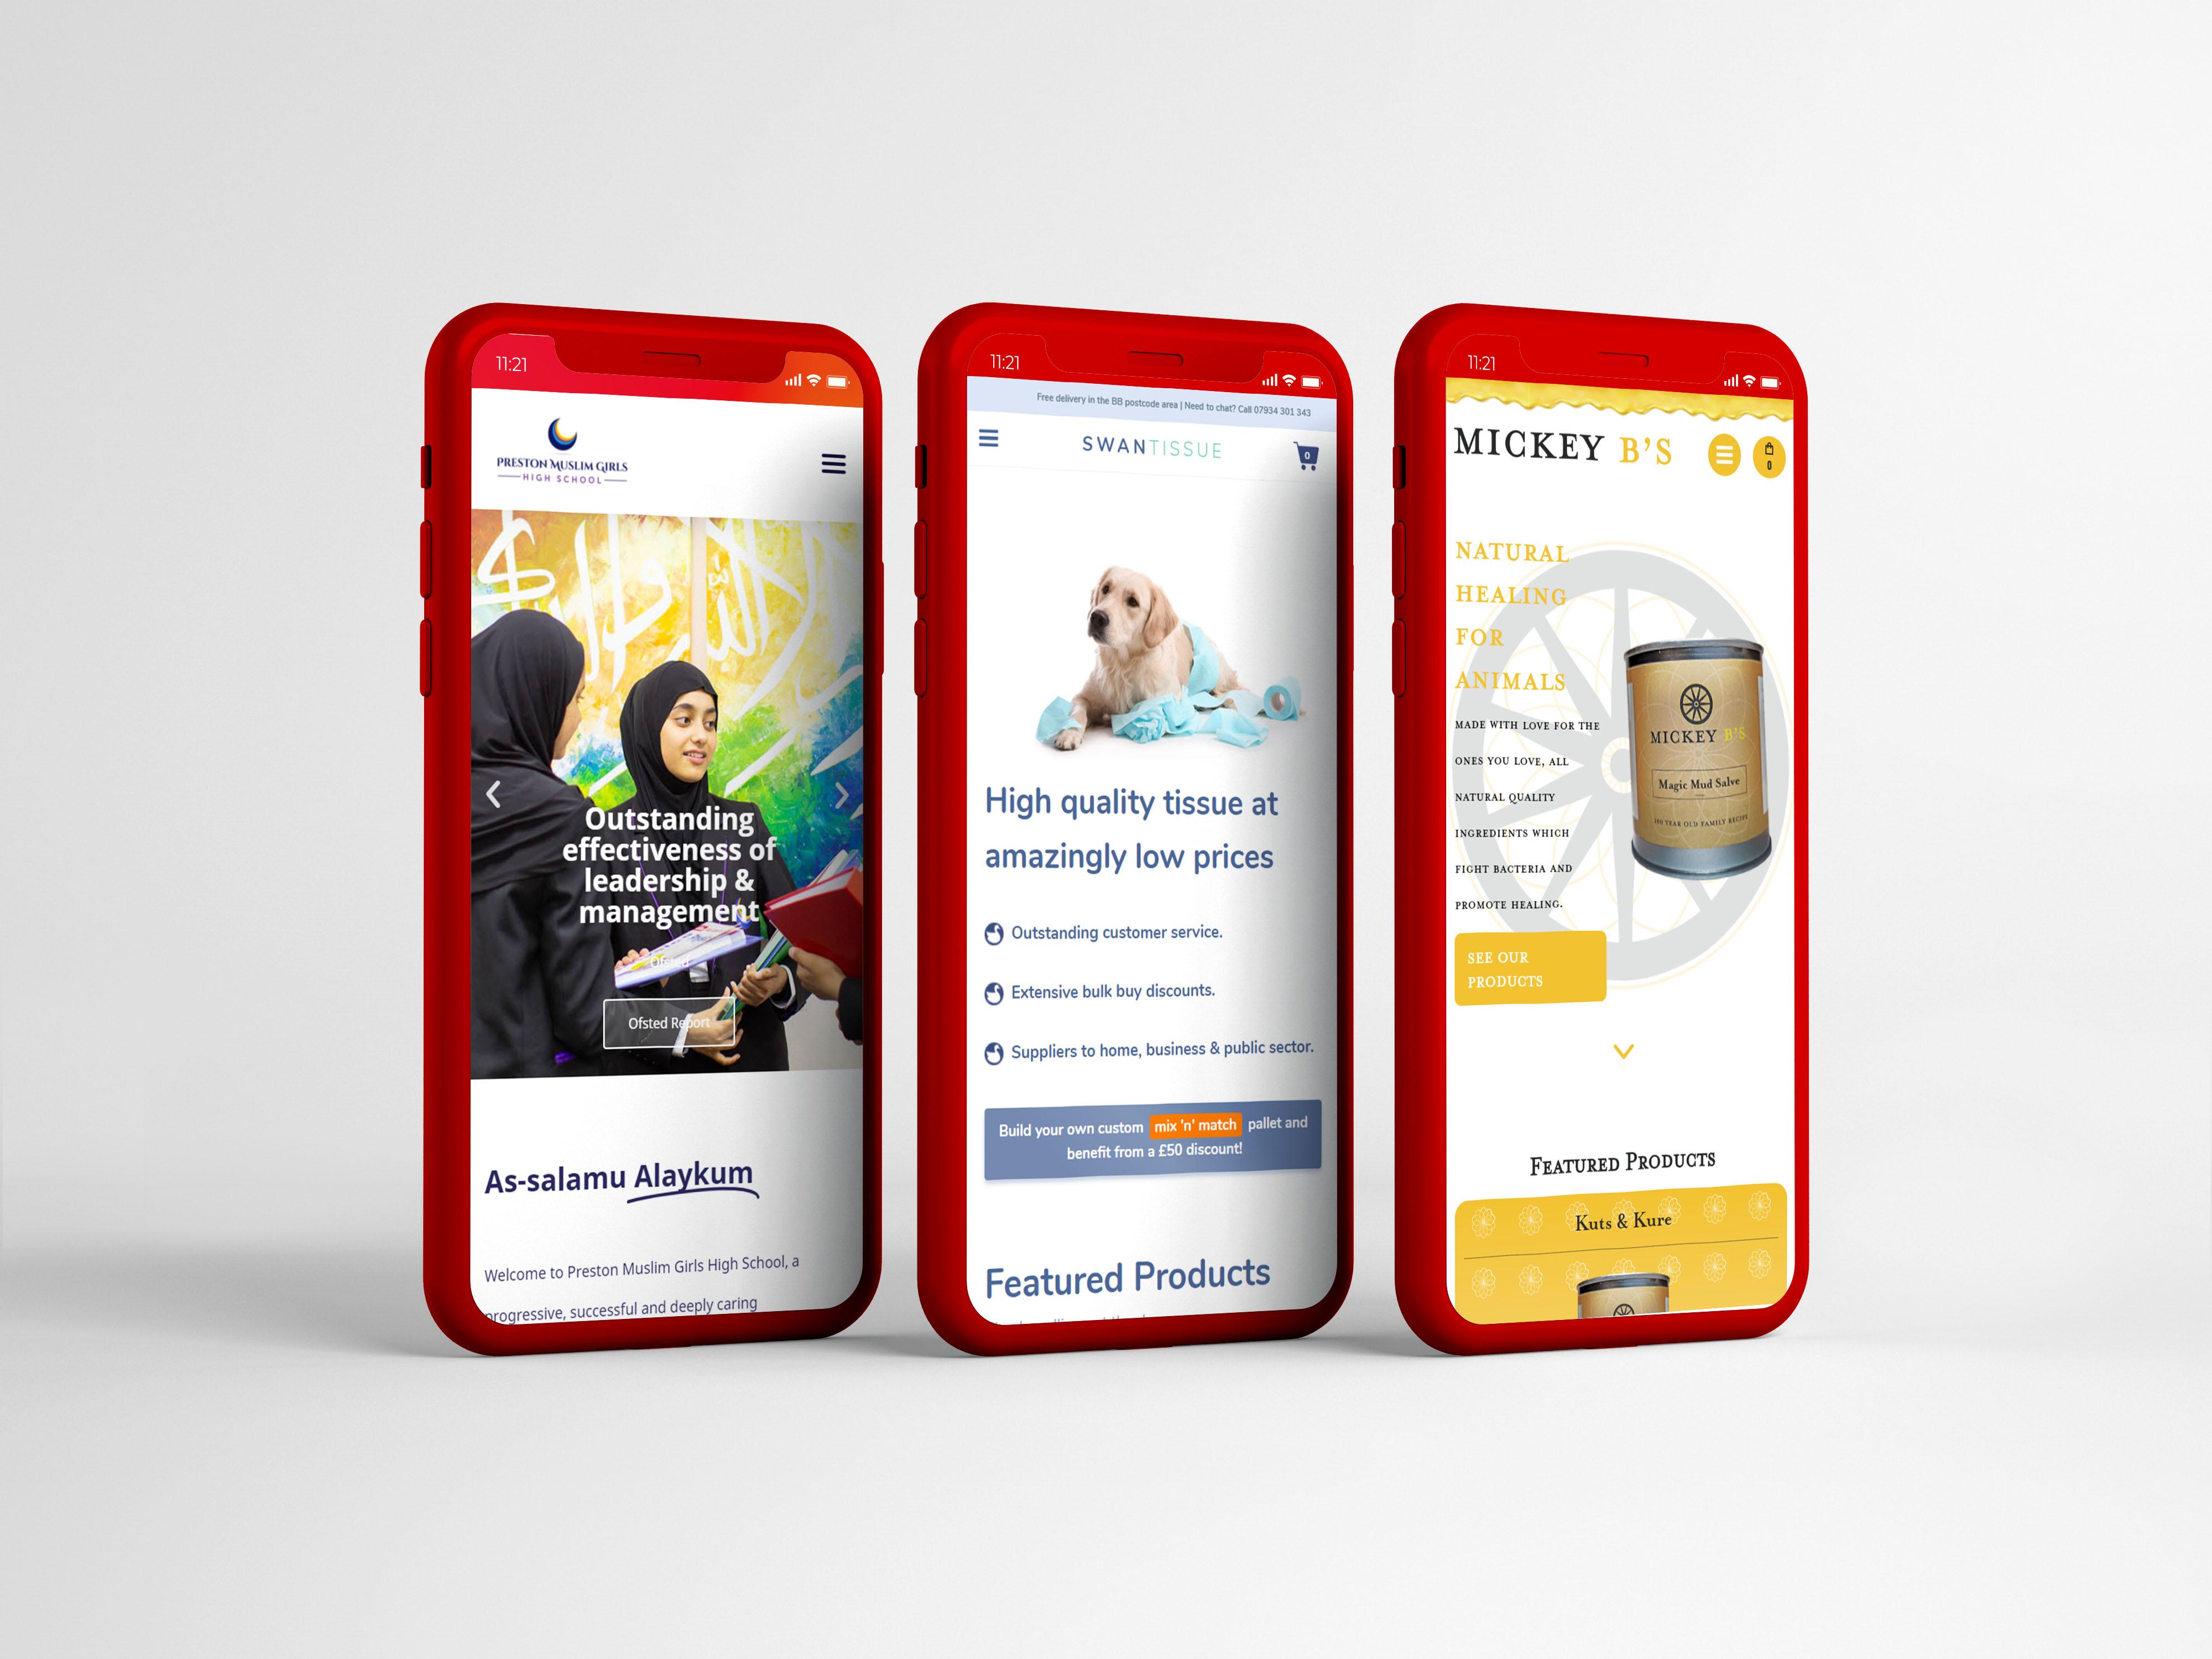 Sample websites shown on red phones